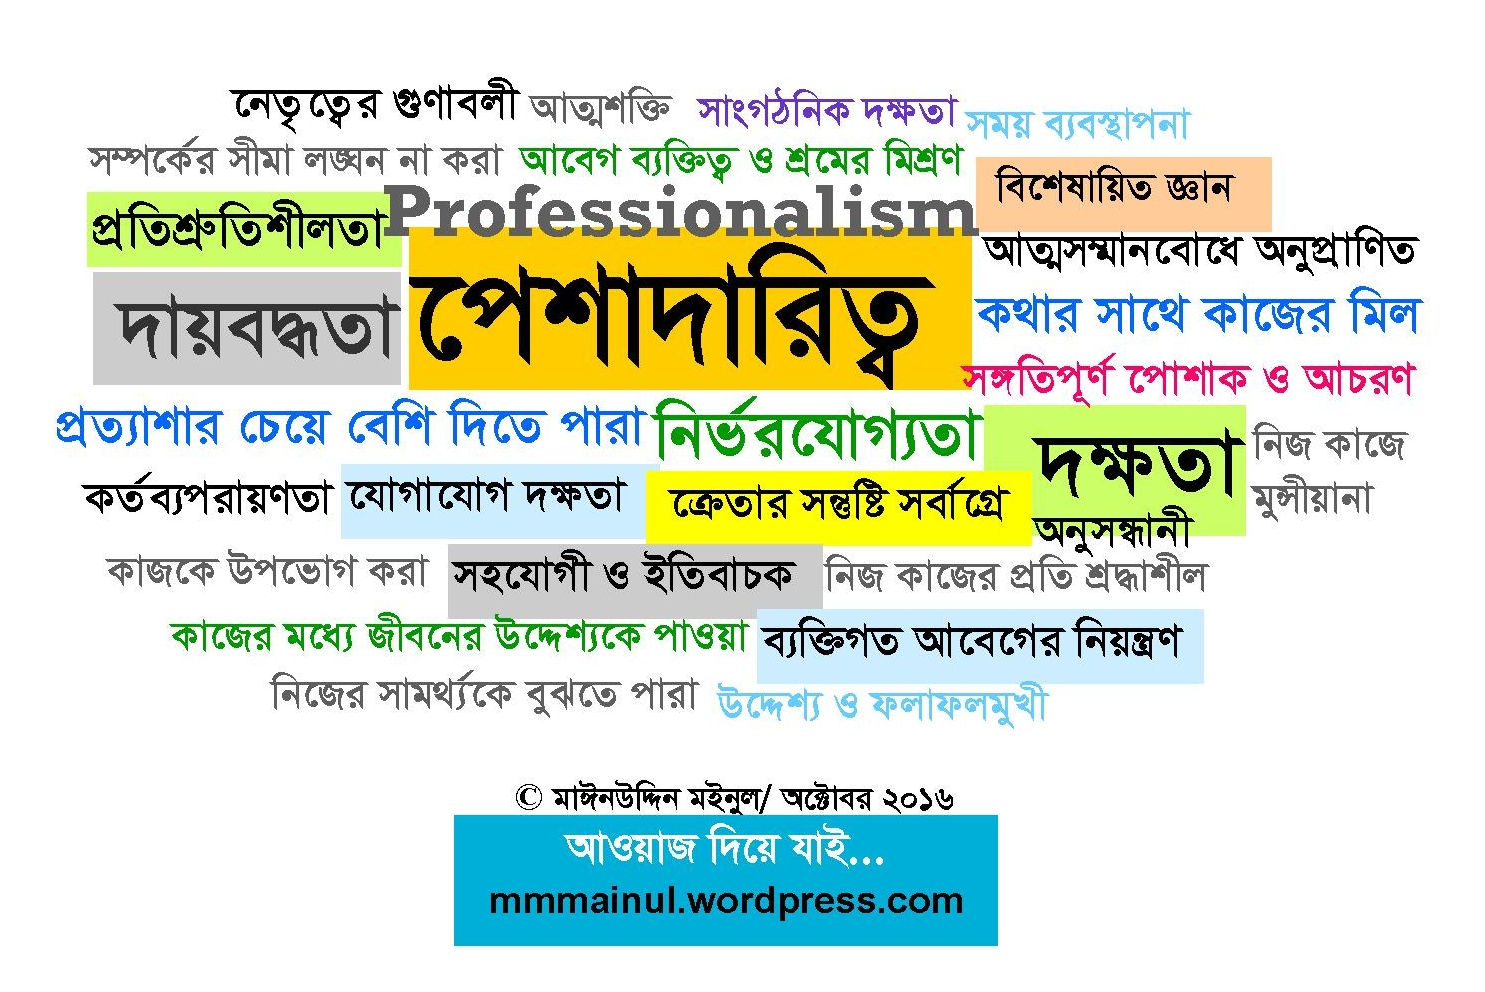 professionalism-mmmainul